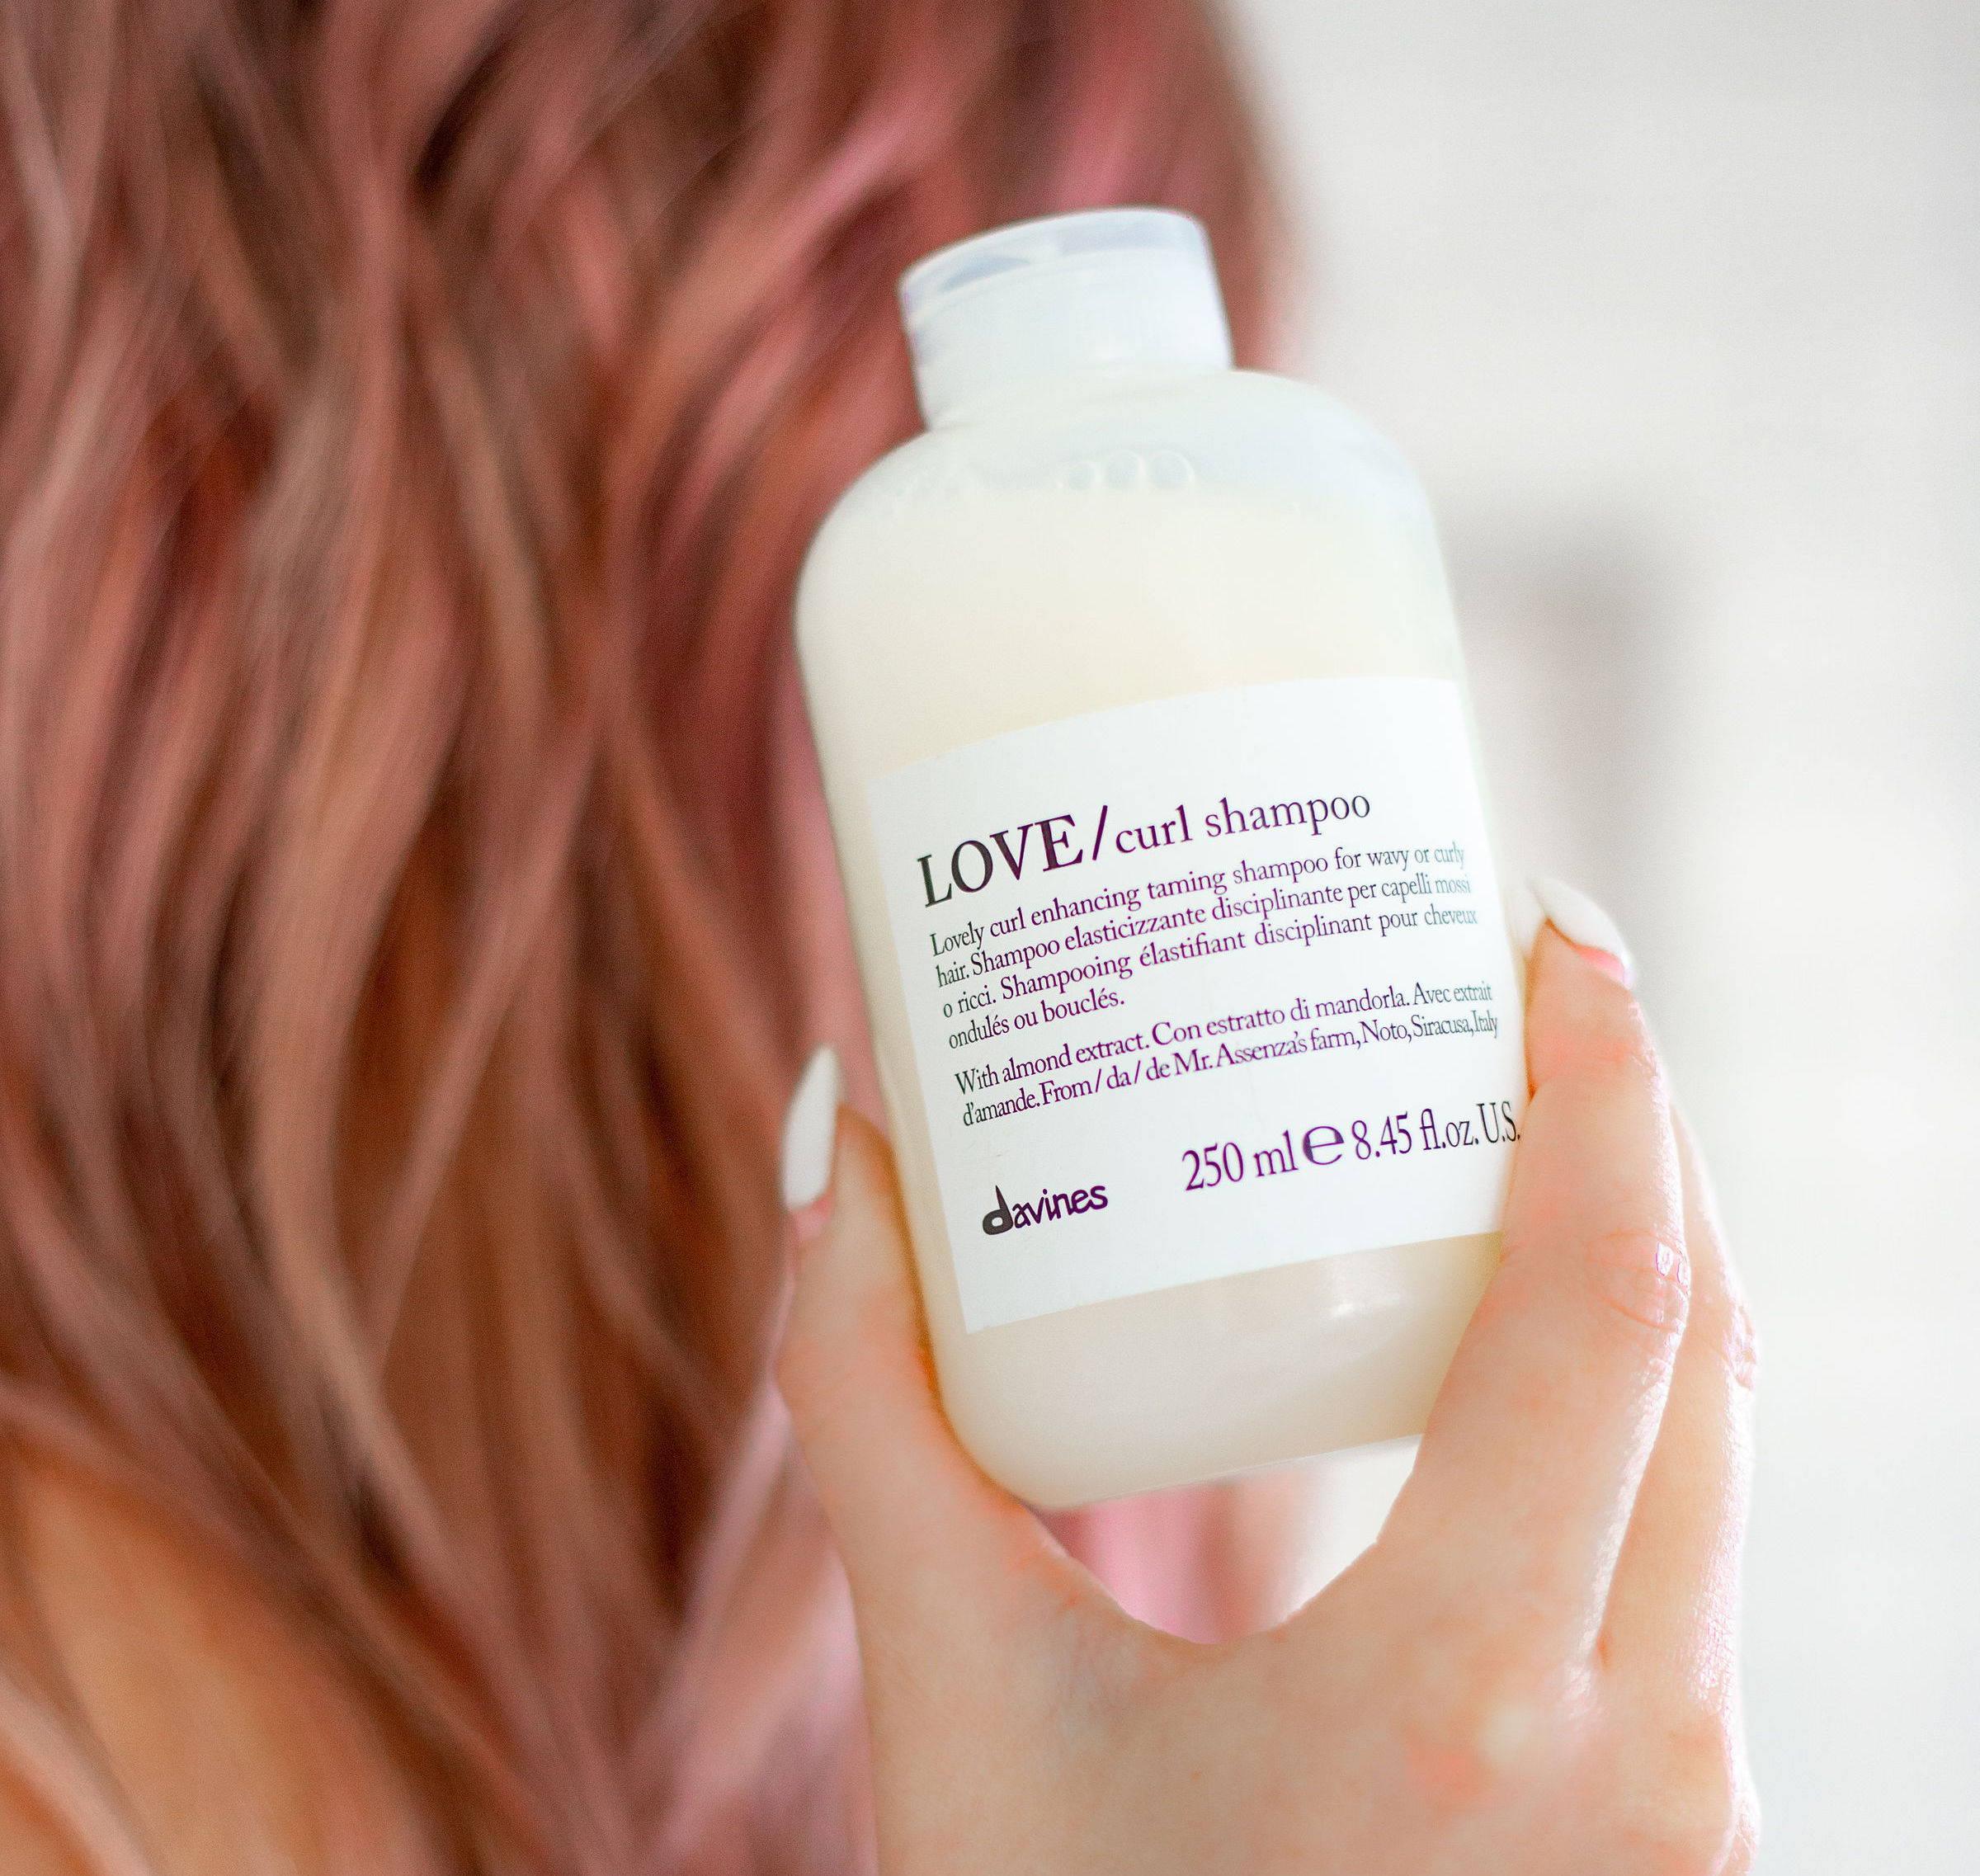 Davines Love Curl Shampoo curly hair care